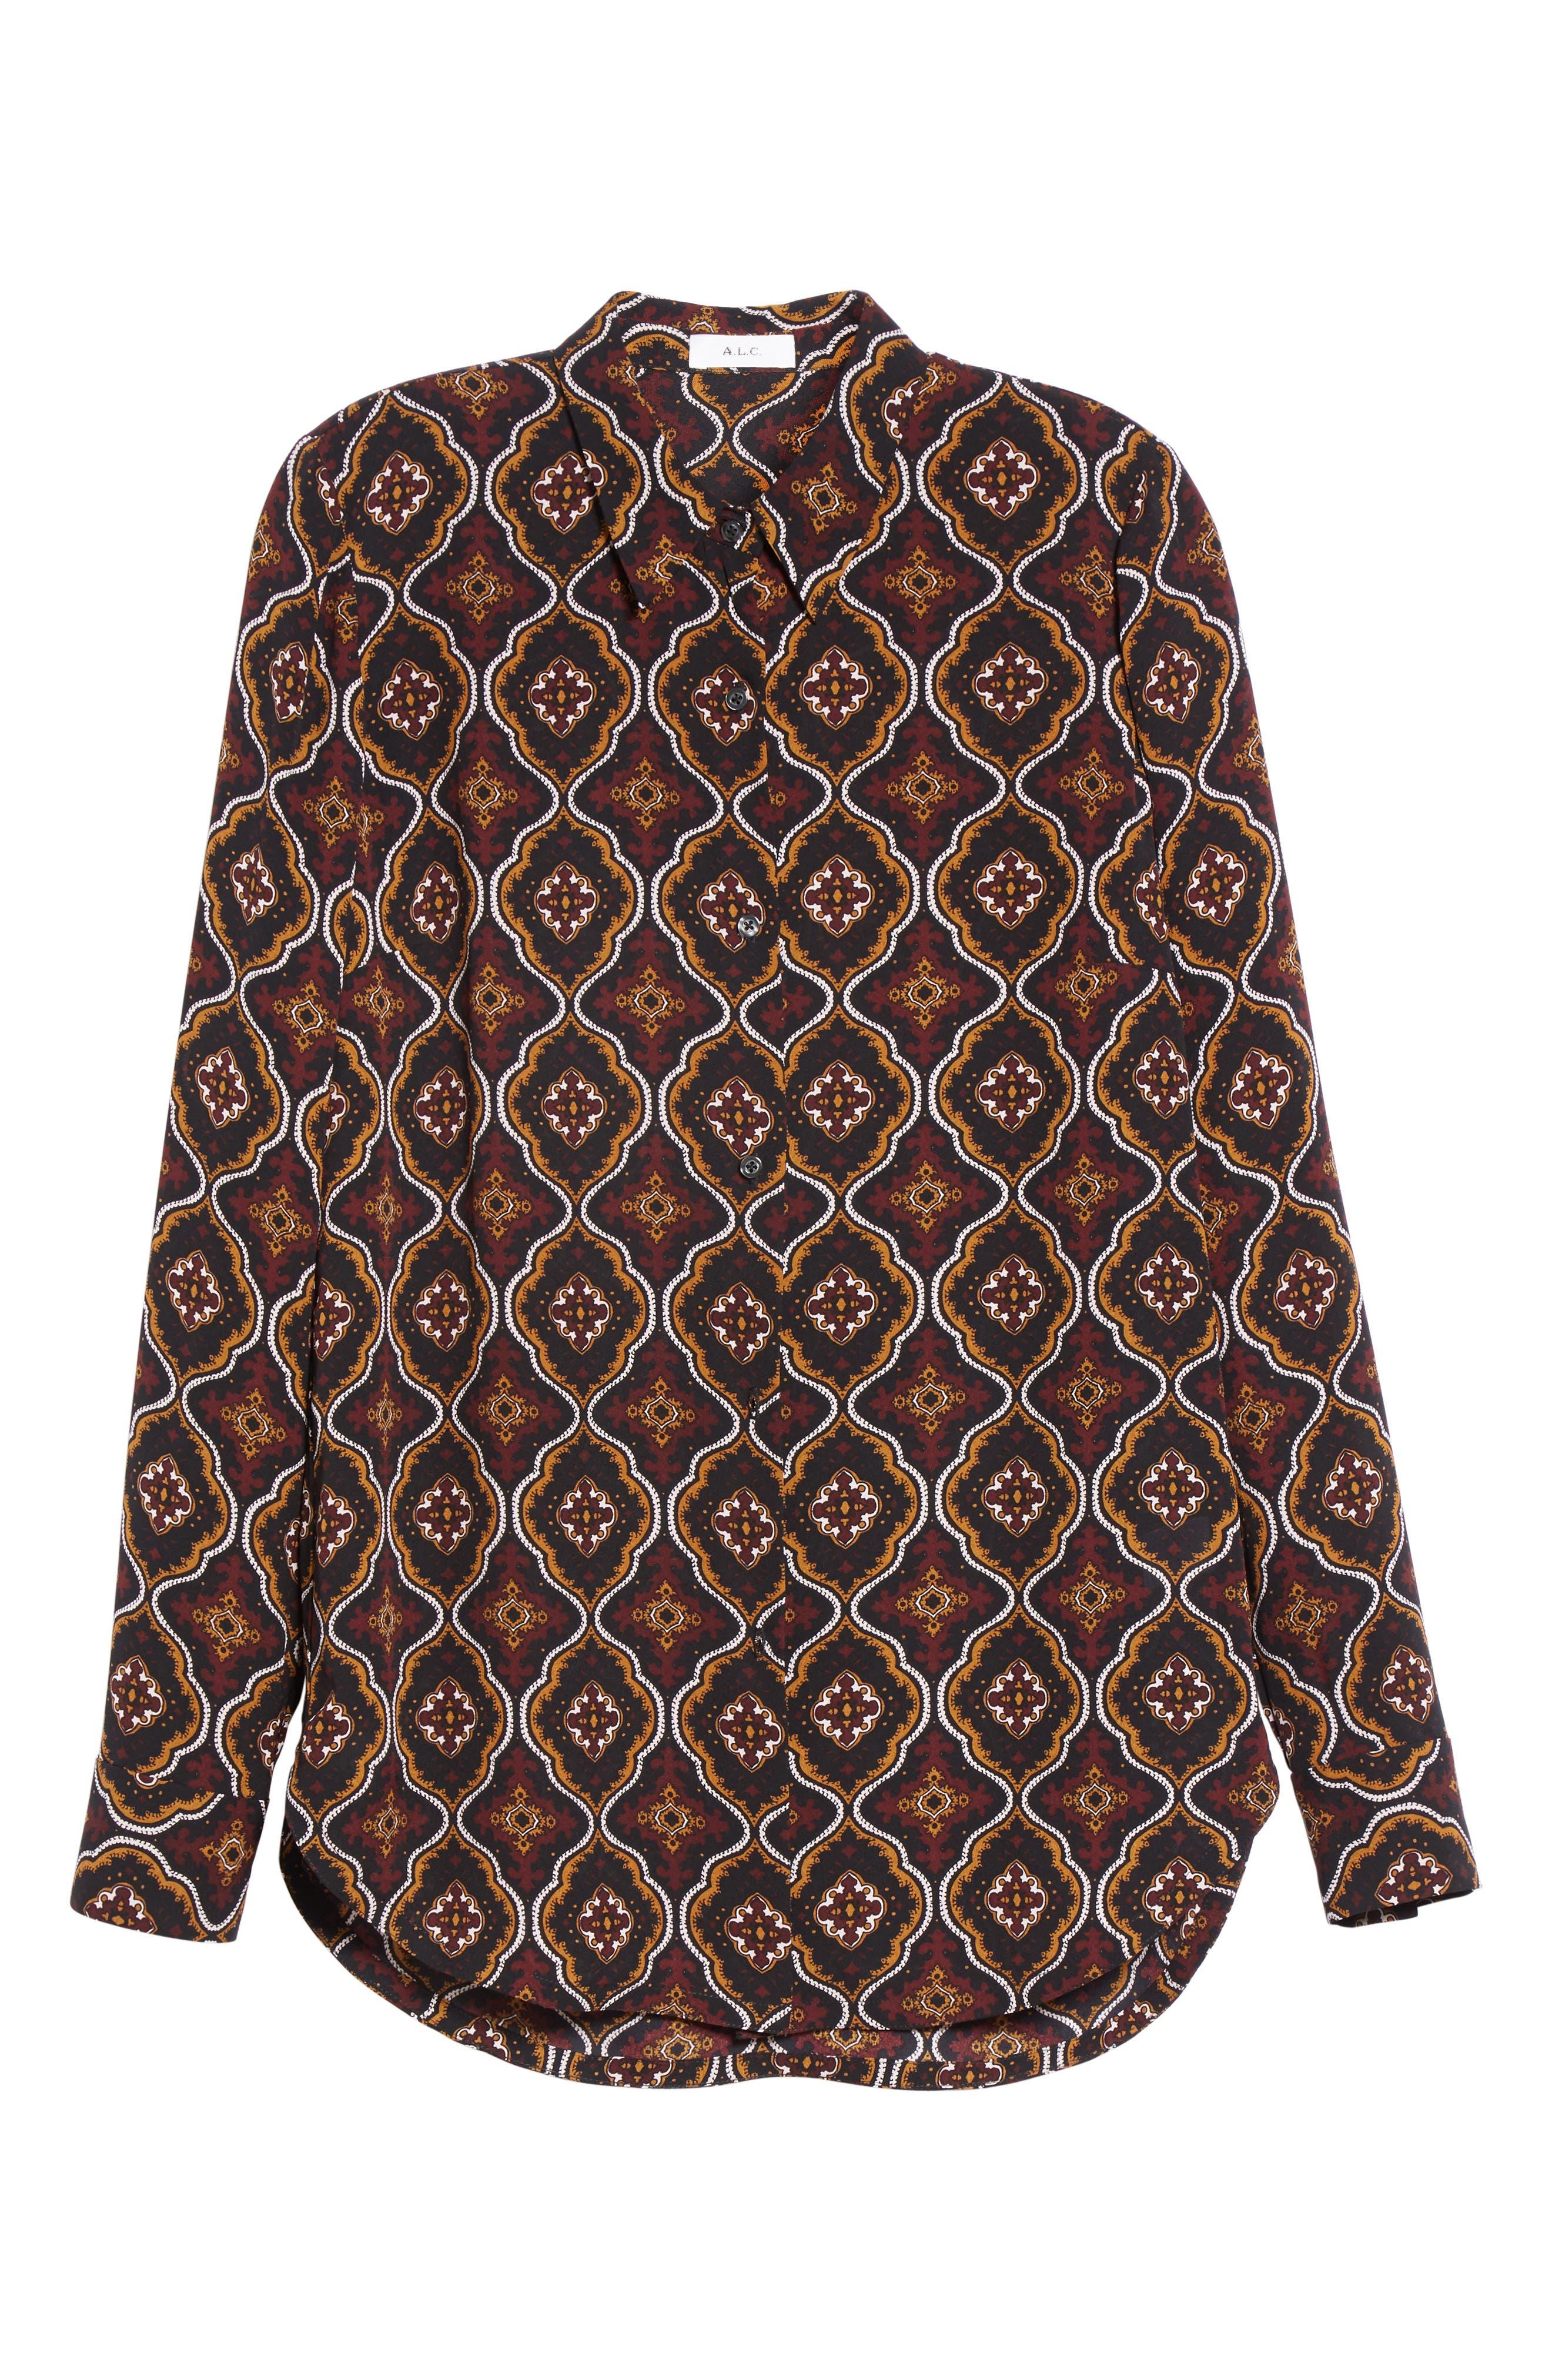 Aubrey Print Silk Top,                             Alternate thumbnail 8, color,                             Burgundy/ Gold Multi